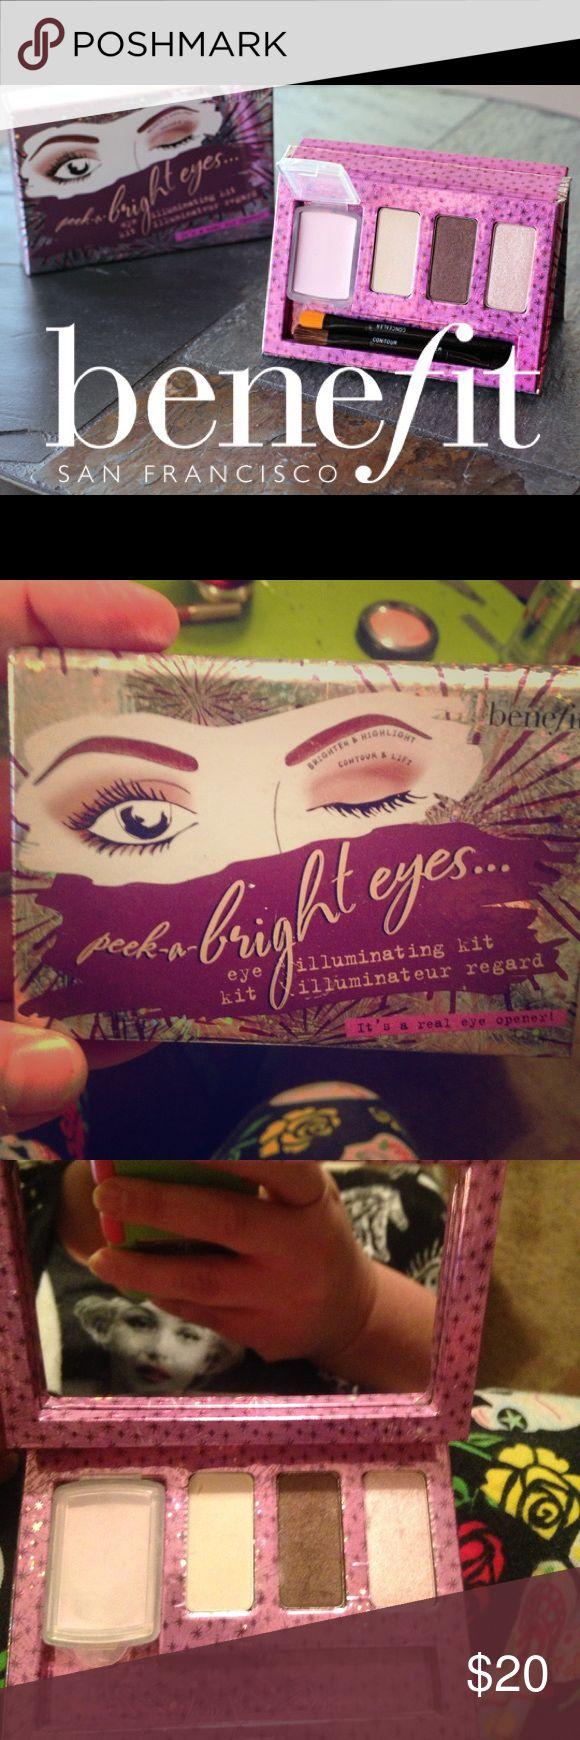 Benefit peek-a-bright eyes illuminating kit Benefit peek-a-bright eyes illuminating kit-swatched only-missing brush-primer-& 3 shadows in cute compact box 😍 Benefit Makeup Eyeshadow